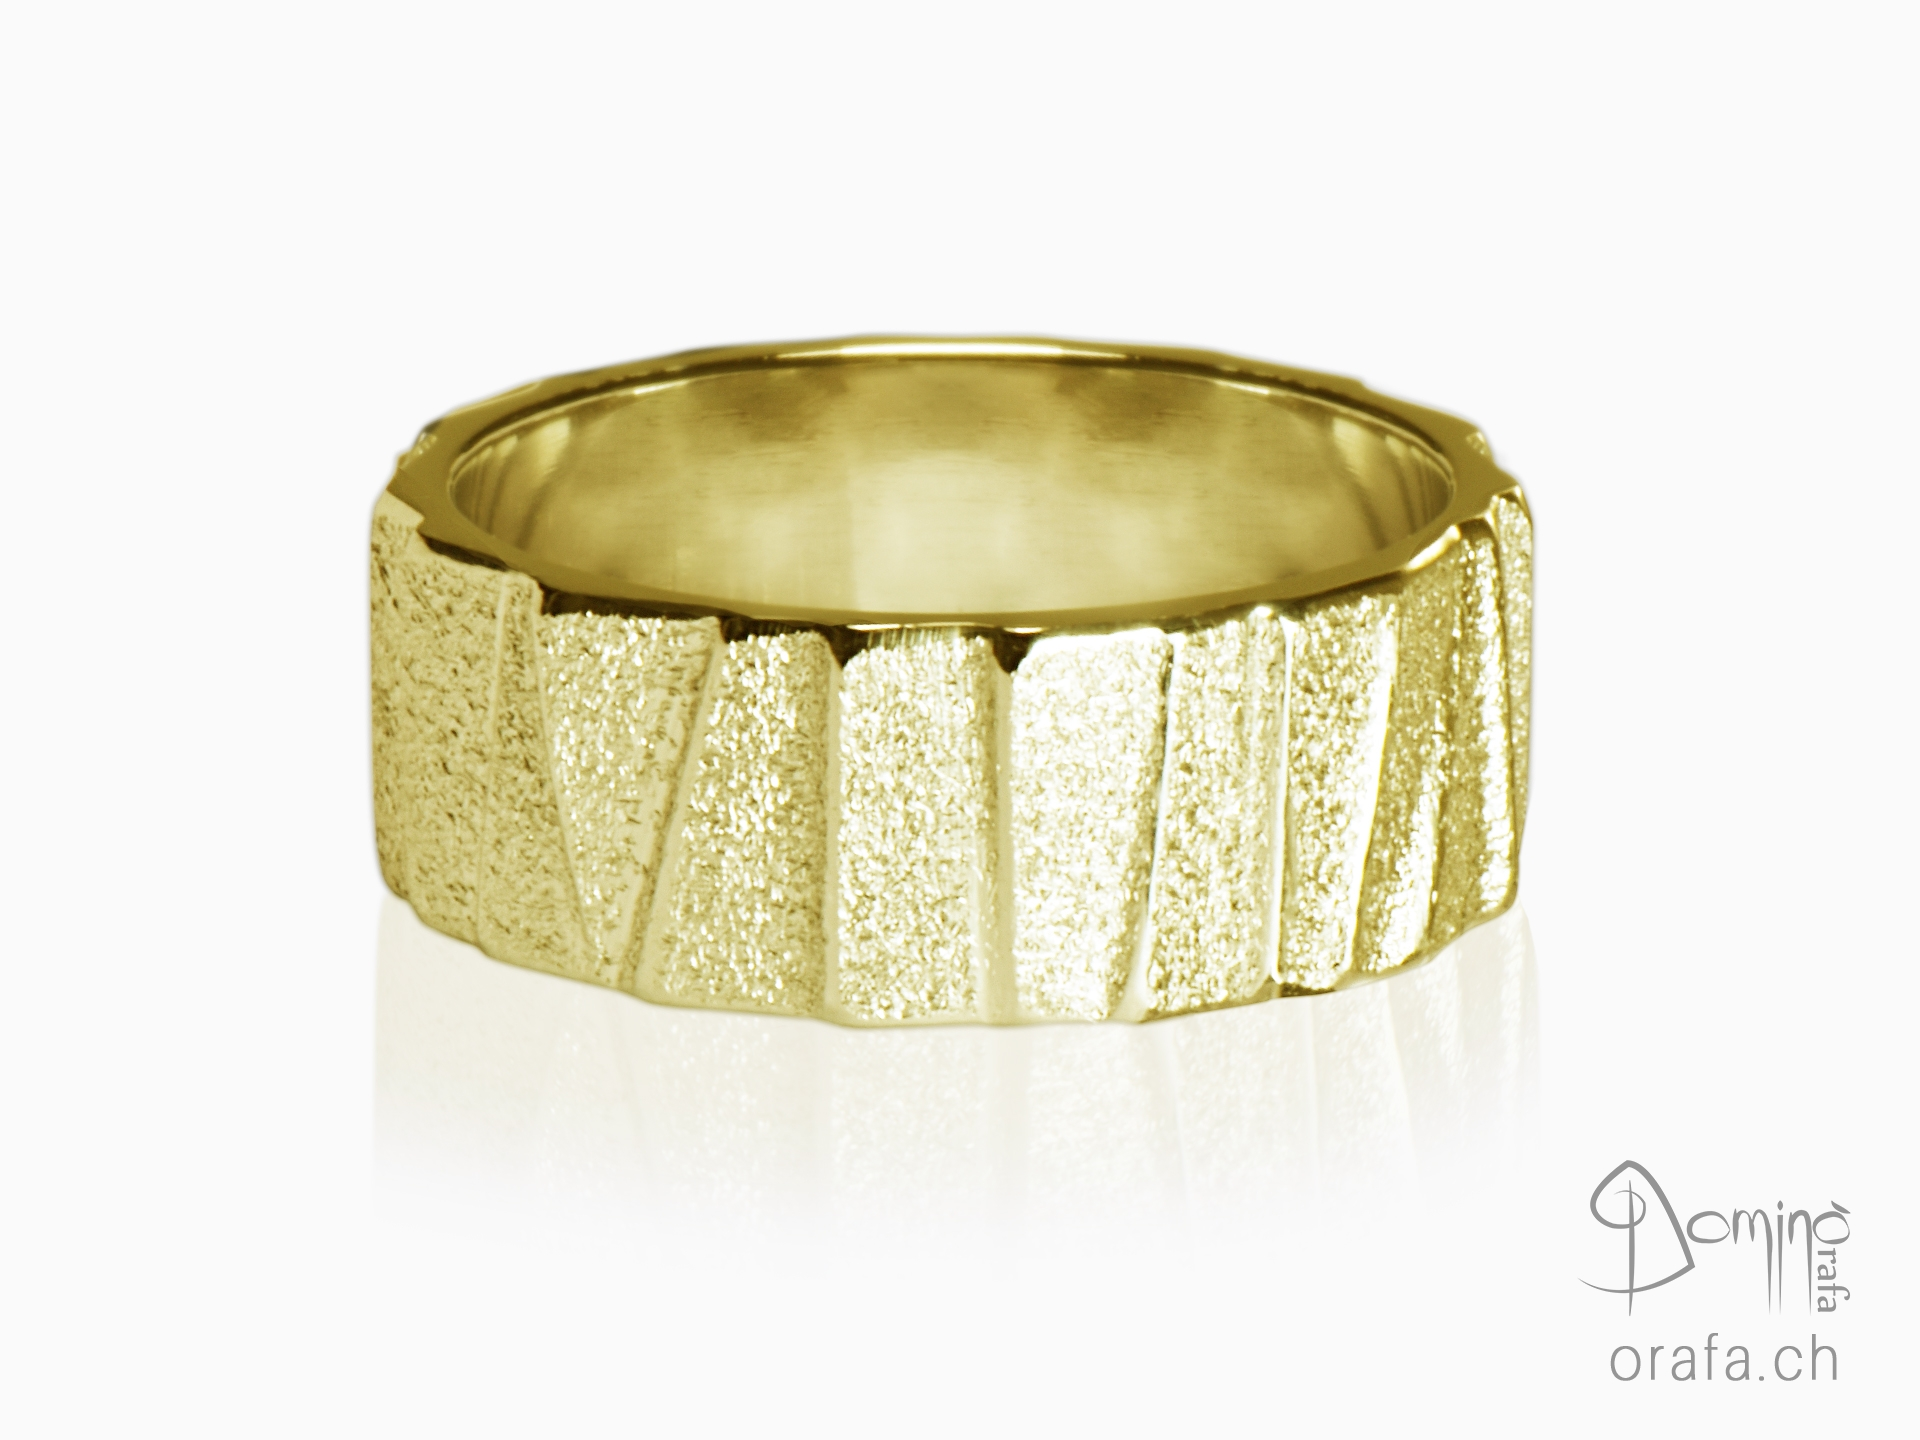 anelli-scalini-irregolari-sabbiati-oro-giallo